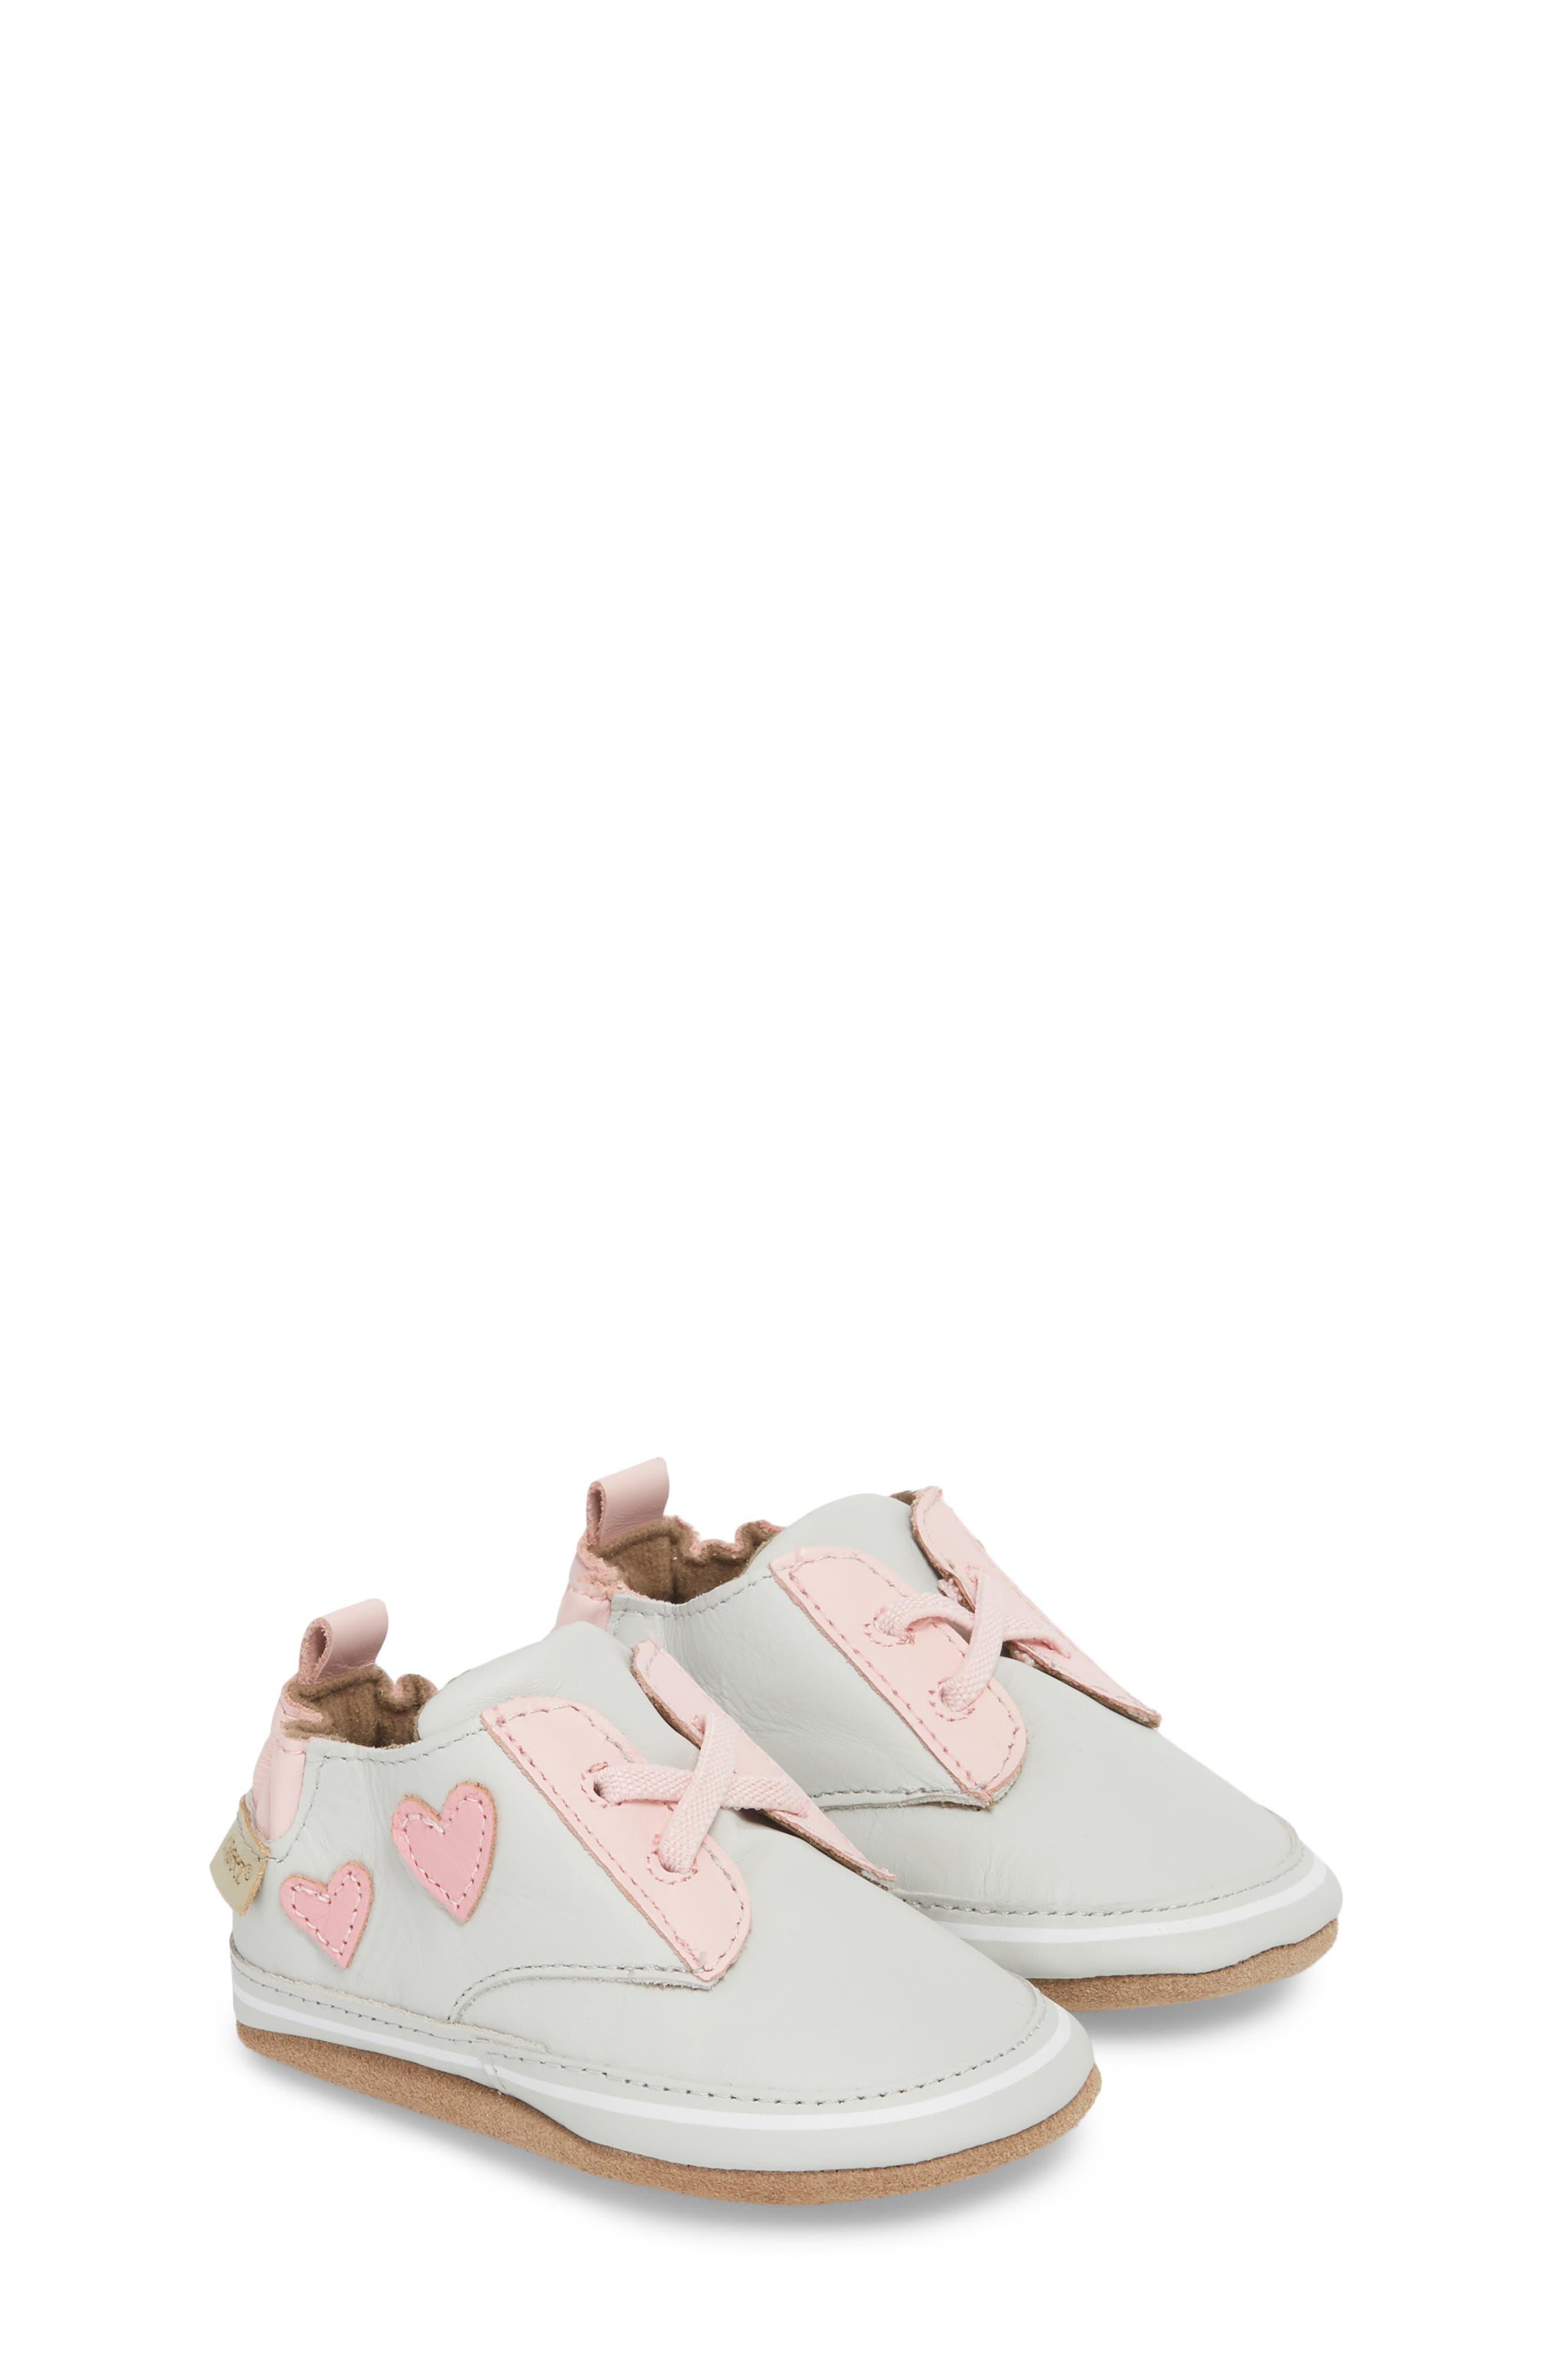 Alternate Image 3  - Robeez® Heartbreaker Slip-On Crib Sneaker (Baby & Walker)